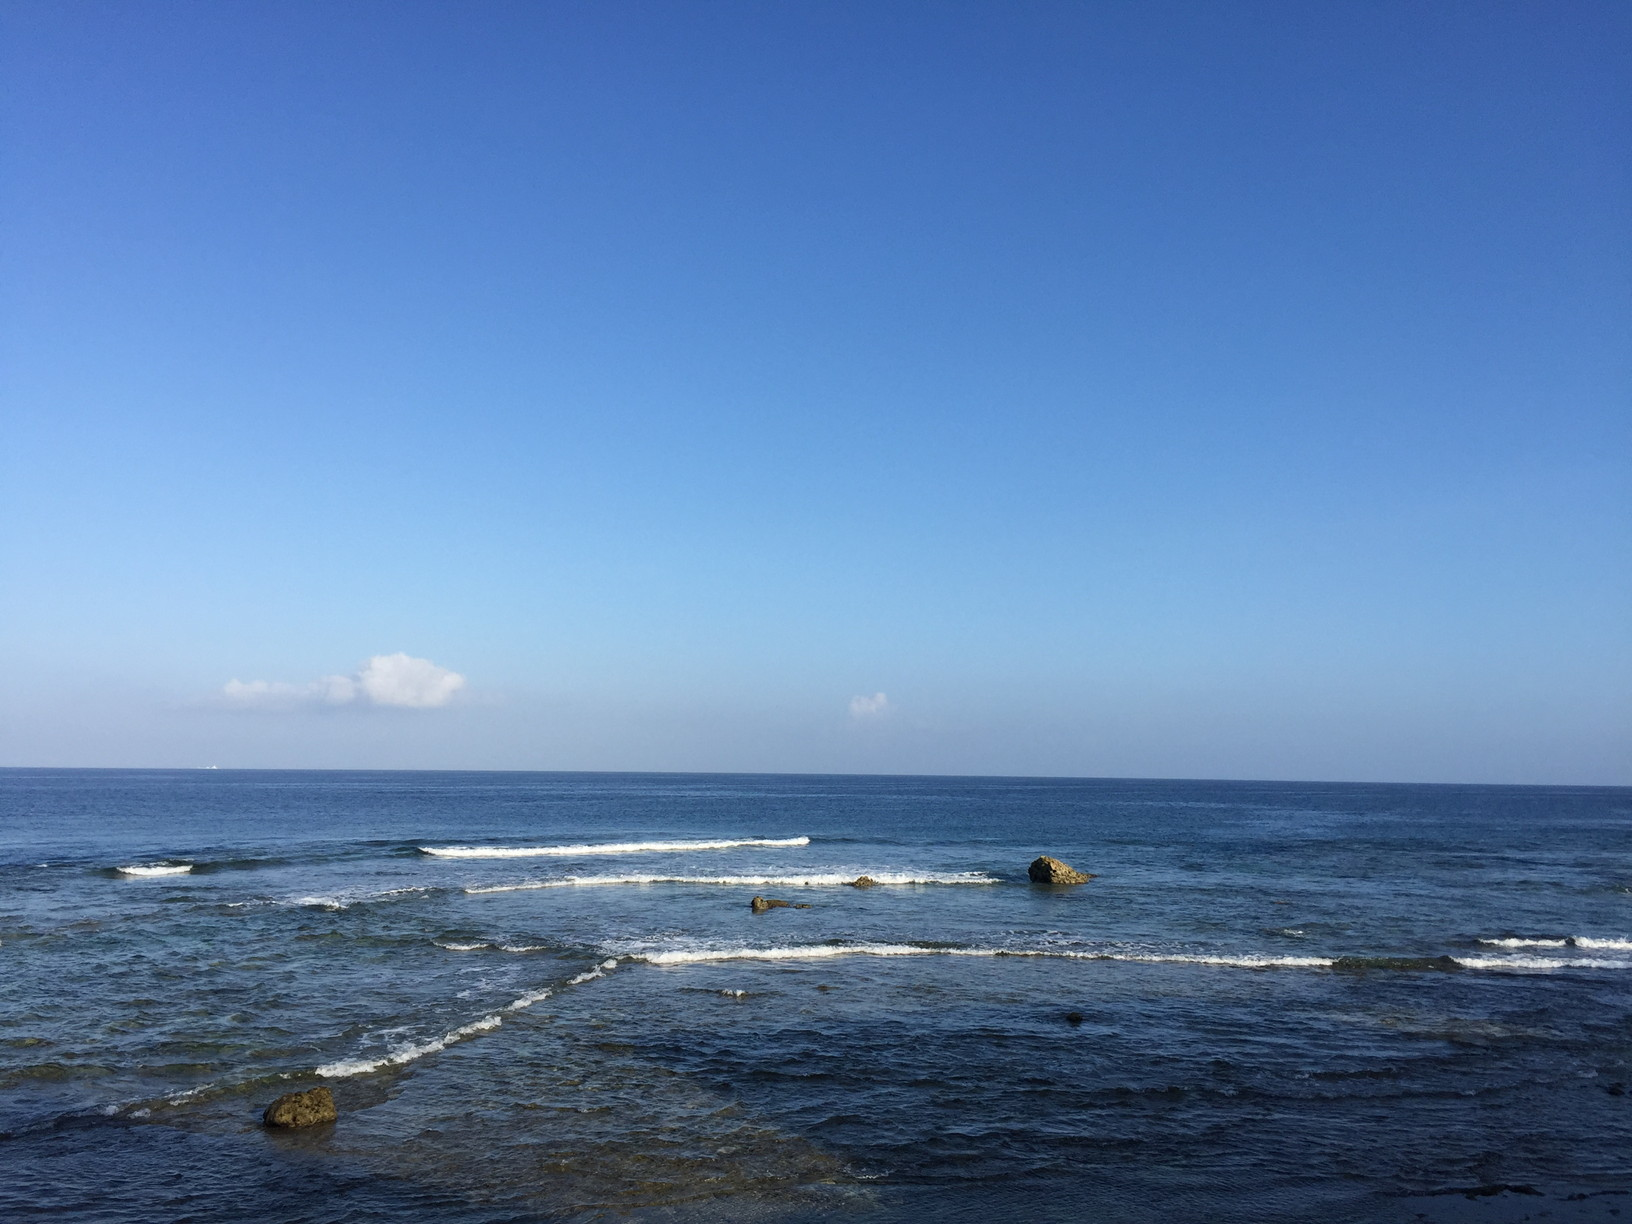 170803 okinawa (46)